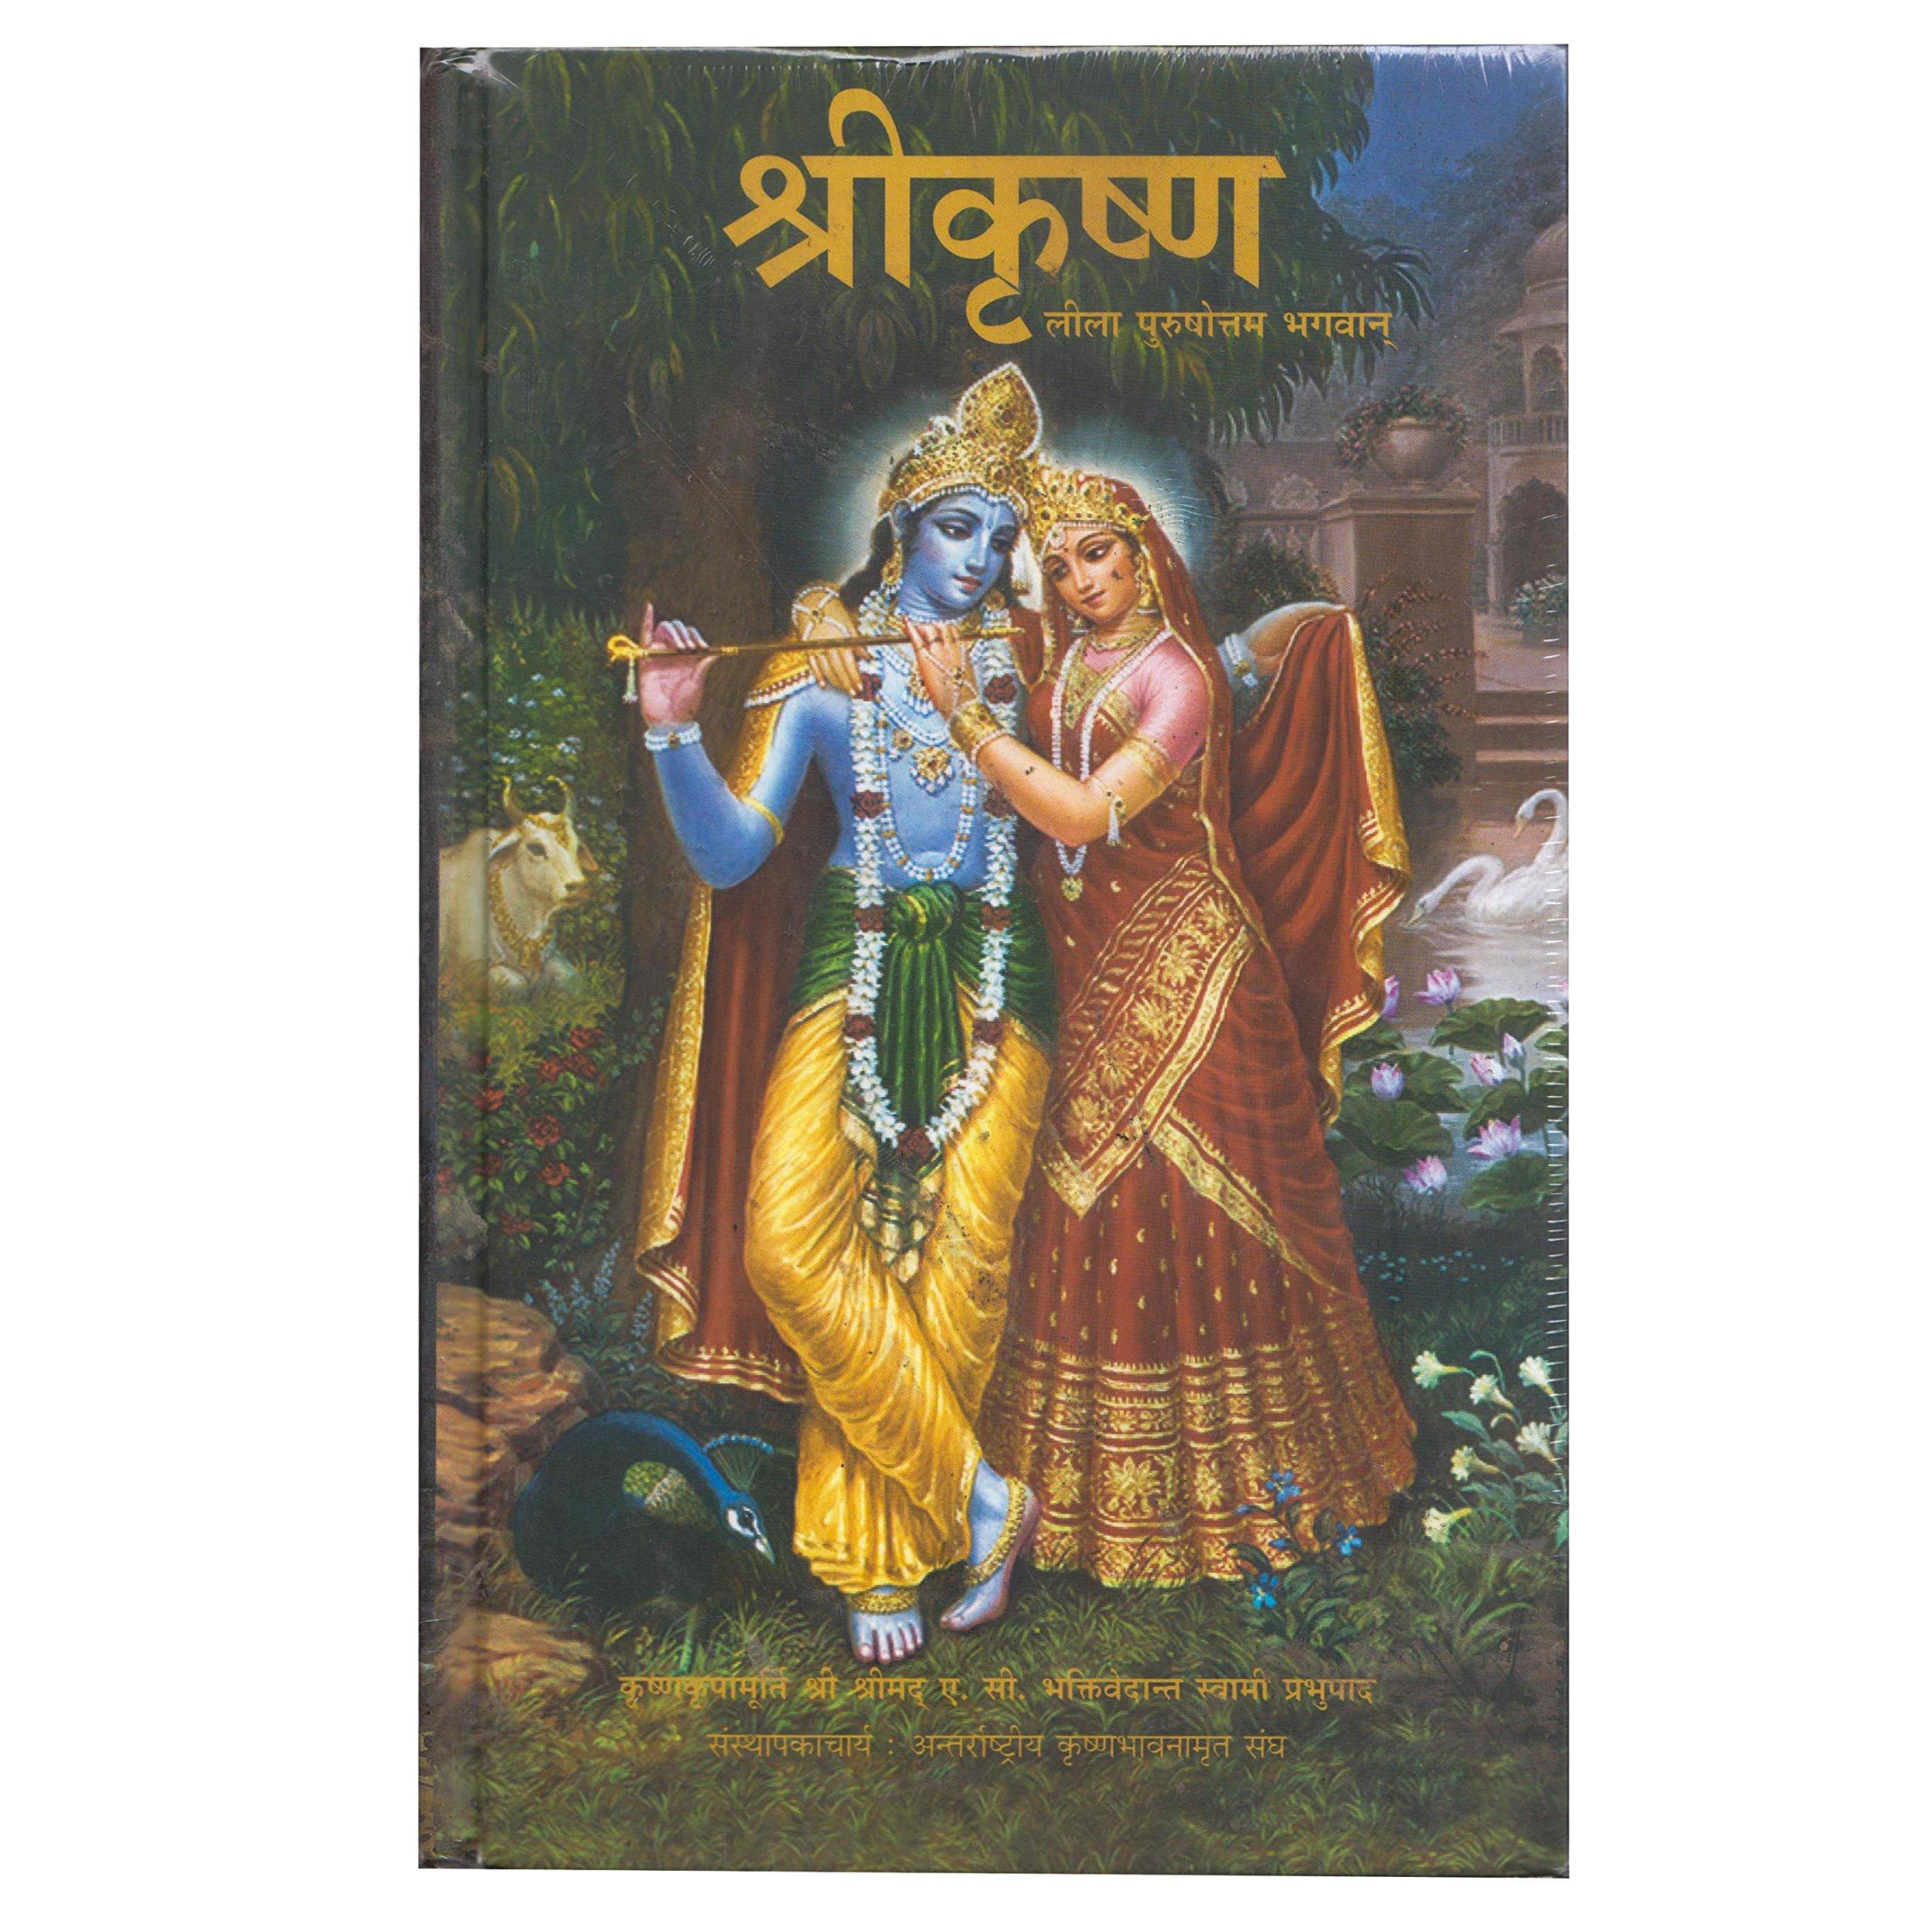 Meiro Shree Krishna Leela Poorshottam Bhagwan A C Bhaktivedanta Swami Prabhupada Amazon In Home Kitchen